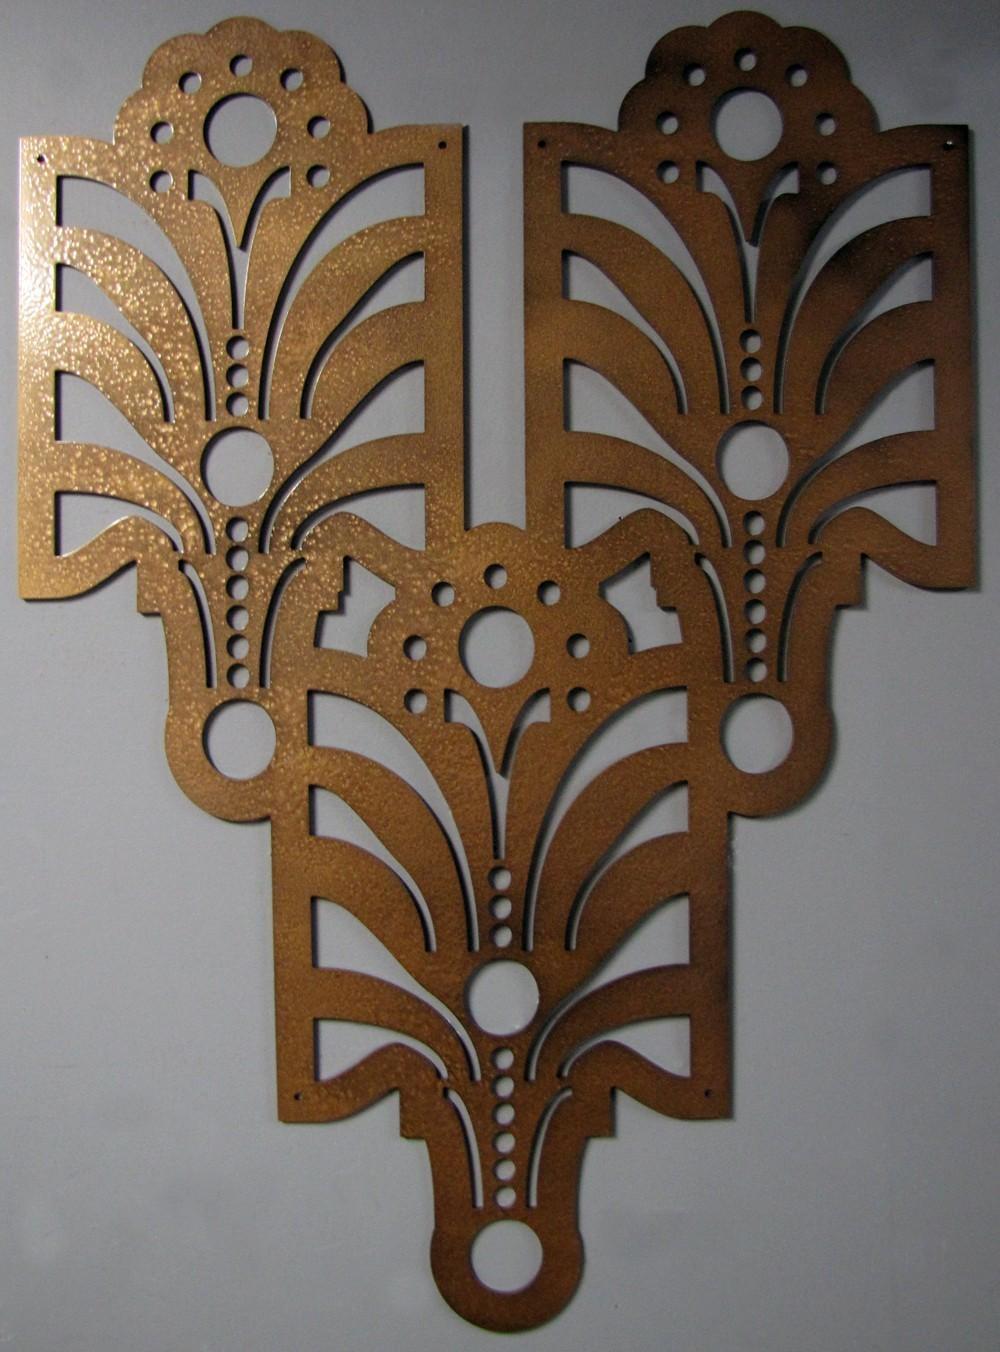 Art Deco Wall Art Luxury Metal Wall Art For Abstract Wall Art With Regard To Art Deco Metal Wall Art (View 2 of 20)